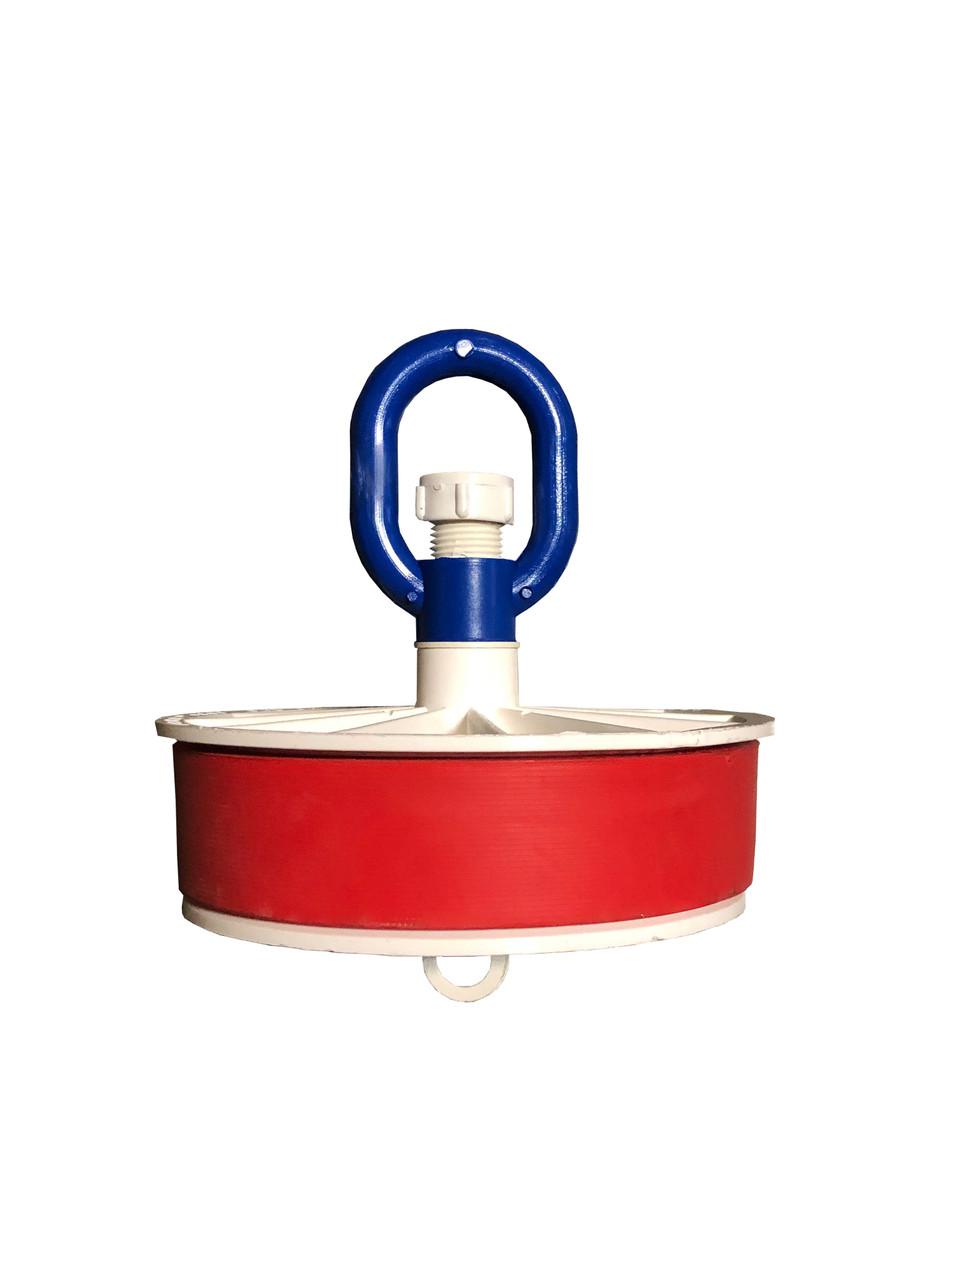 Kwikie Duct Plug with Loop Nut